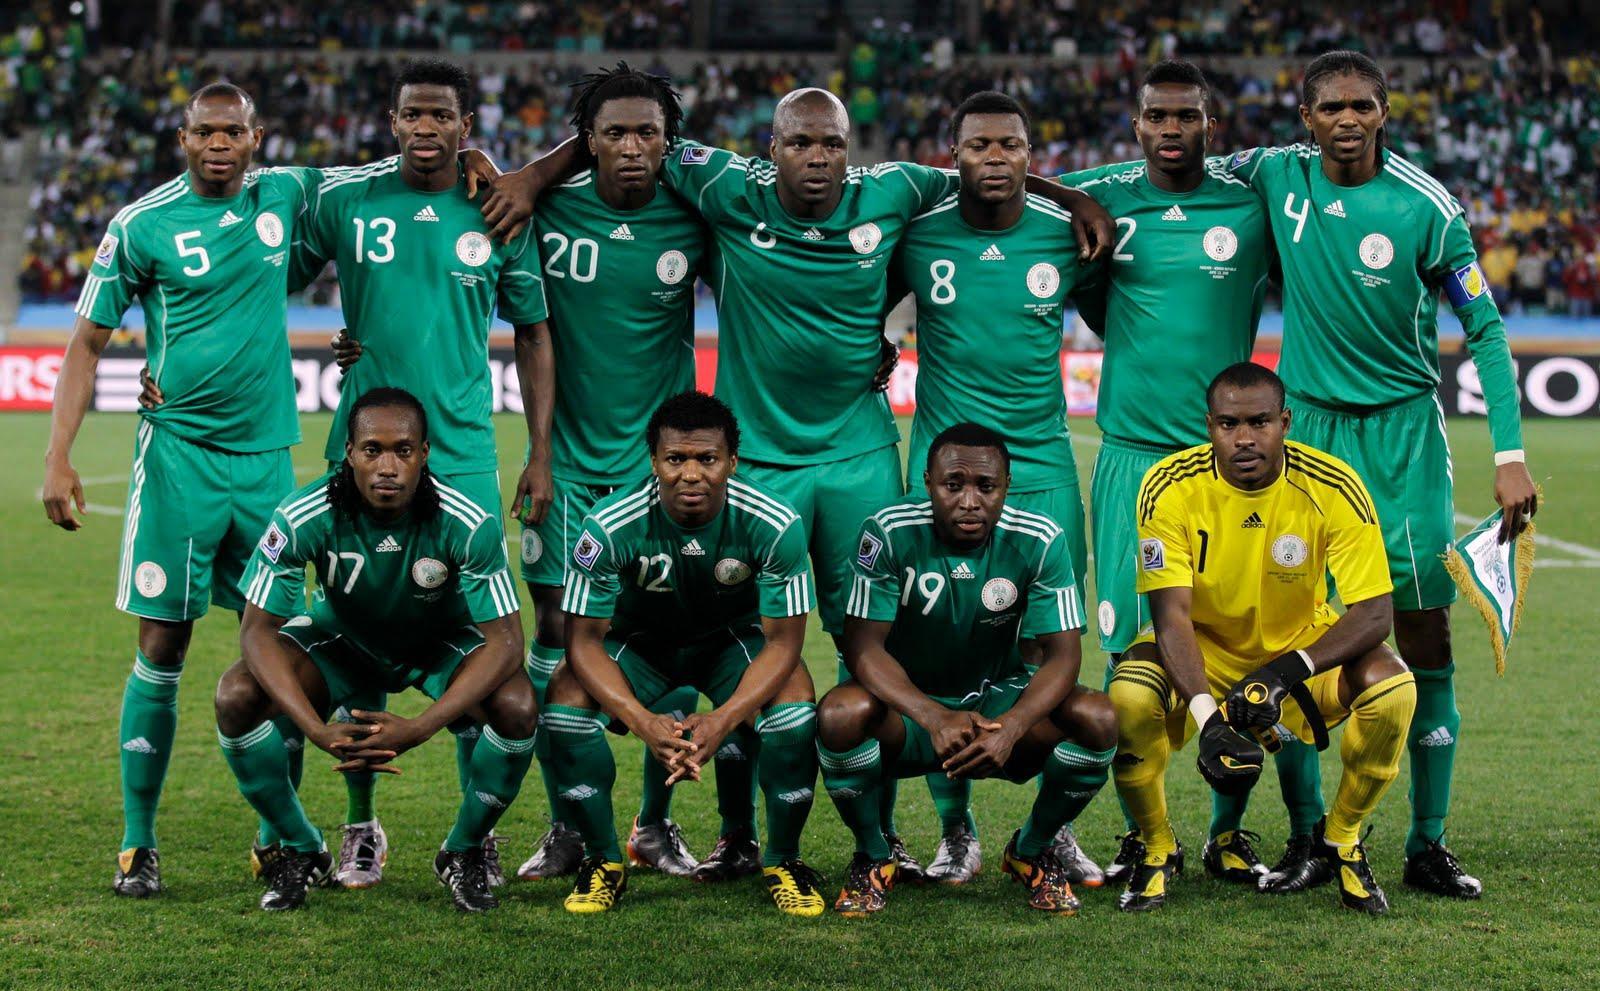 Nigeria National Football Team Background 7